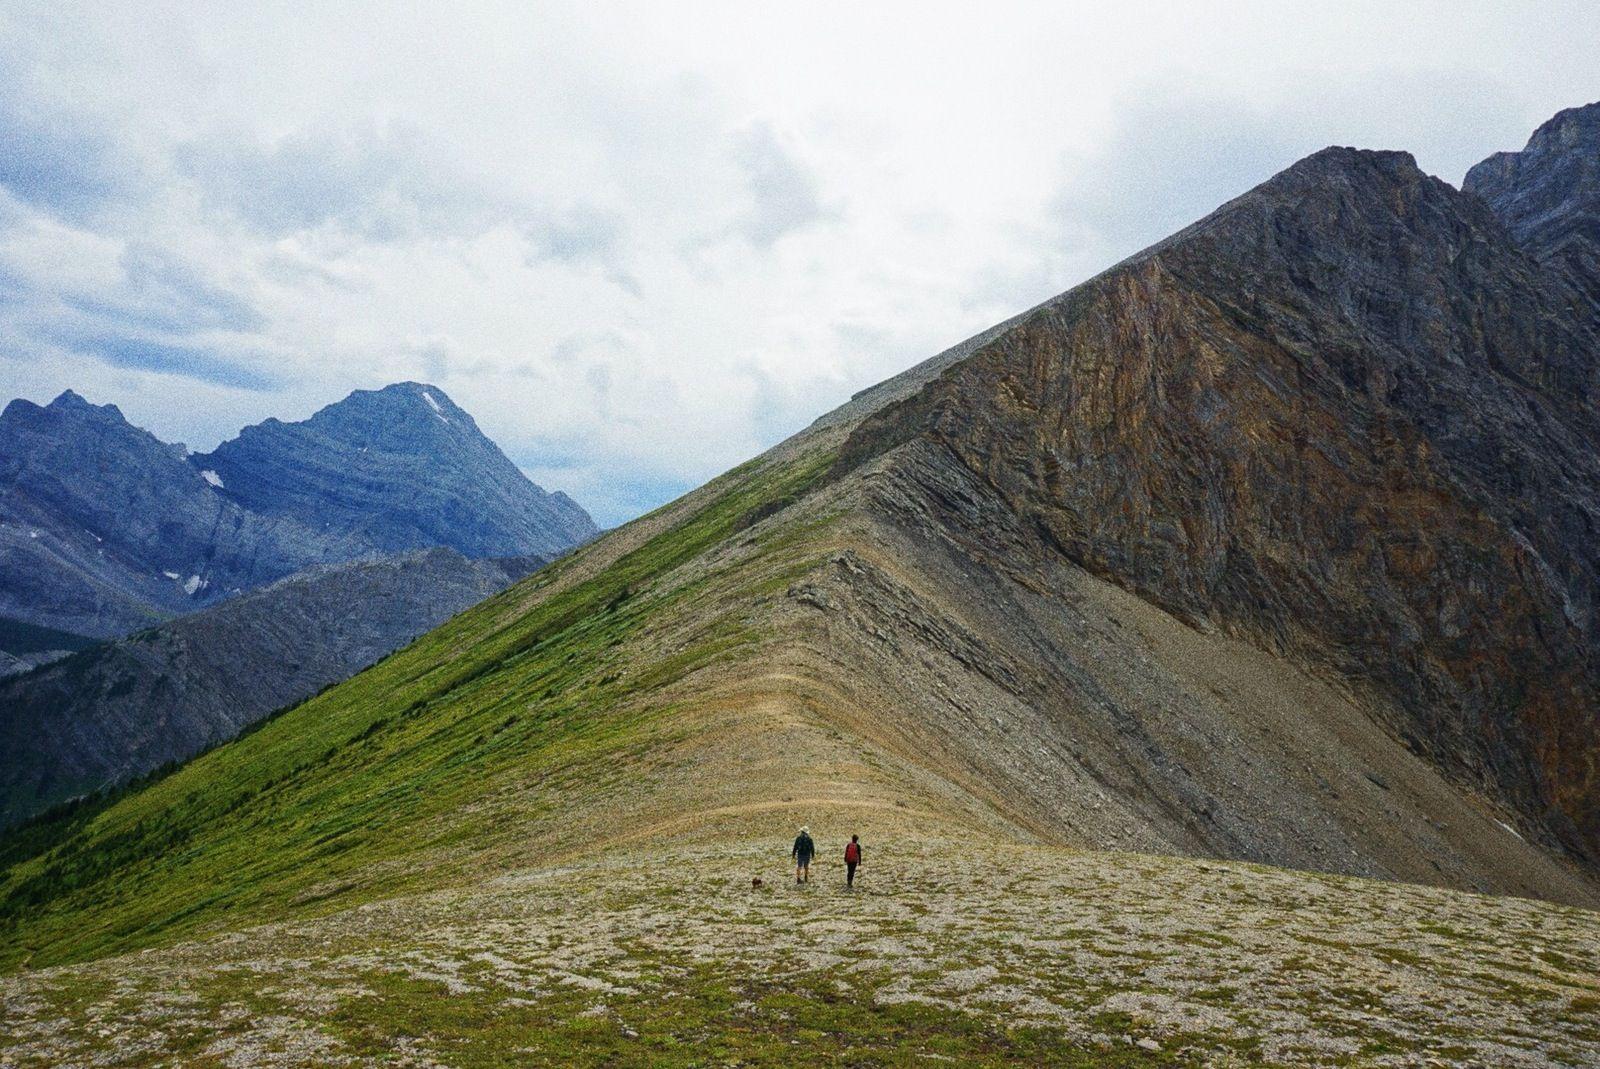 Guinn's Pass in Kananaskis Country, Alberta, Canada.